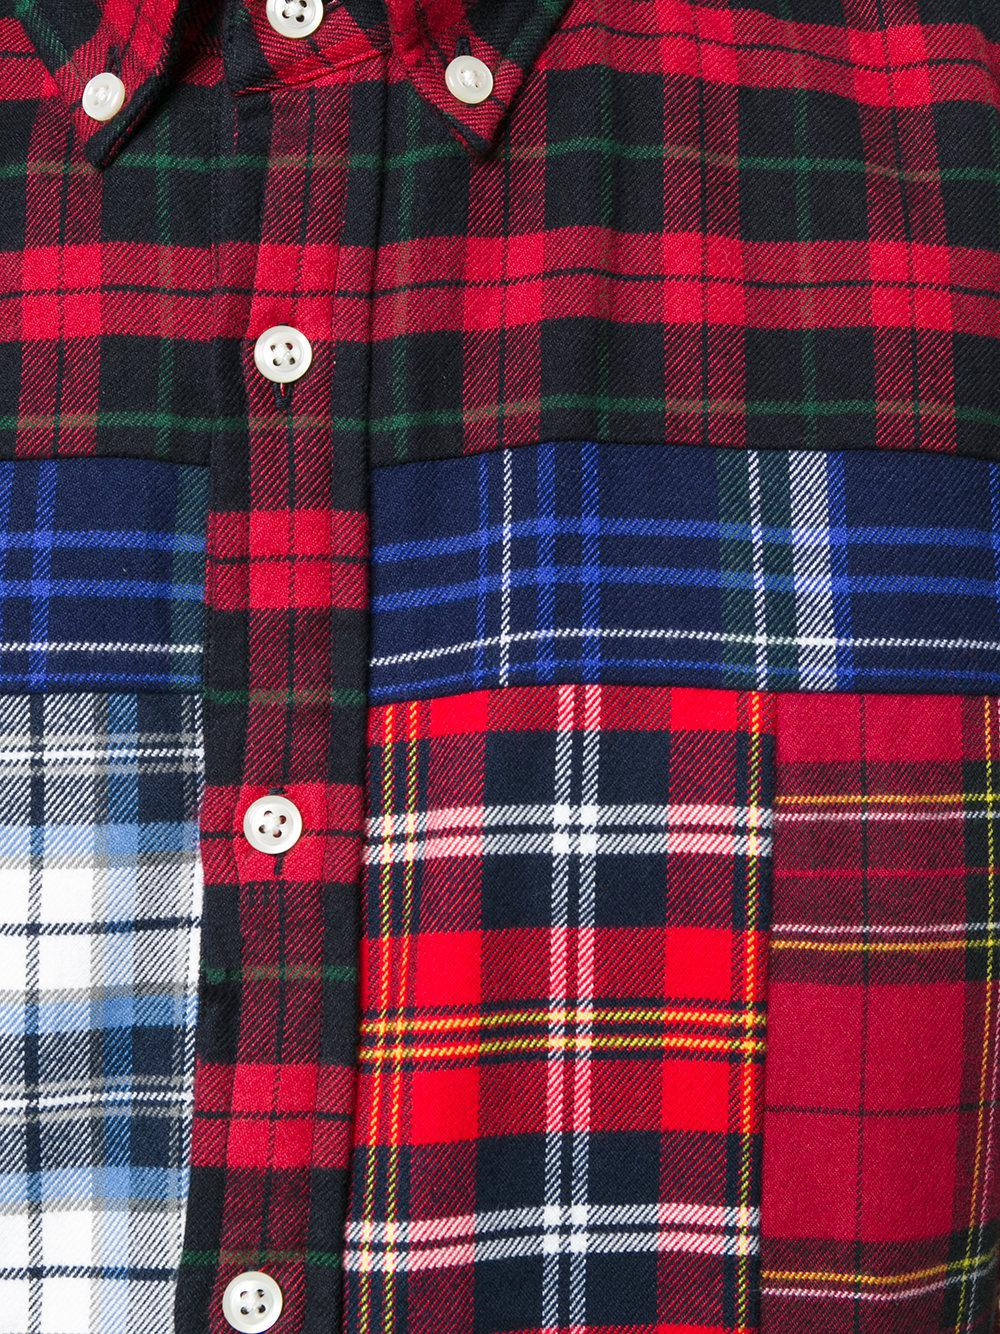 fc997326 Tommy Hilfiger Patchwork Tartan Shirt in Red for Men - Lyst